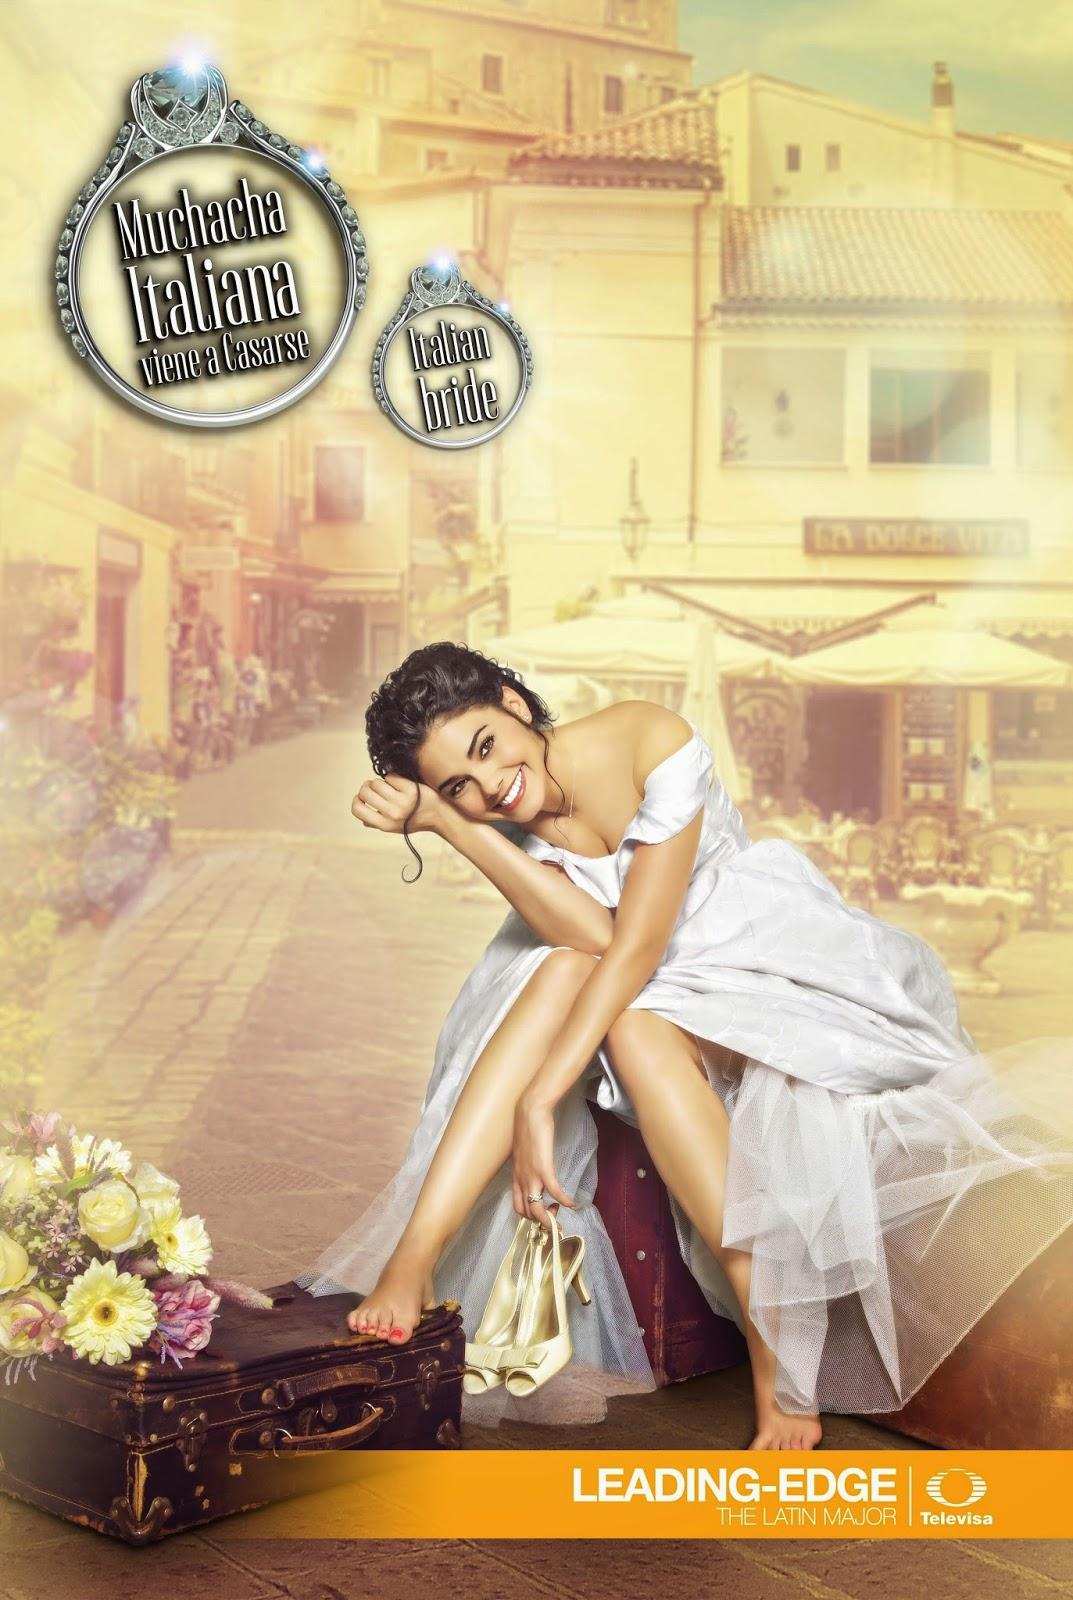 Italian Bride (Hindi Dubbed) Season 1 Episode 6 Hindi 720p WEB-DL 400MB Download